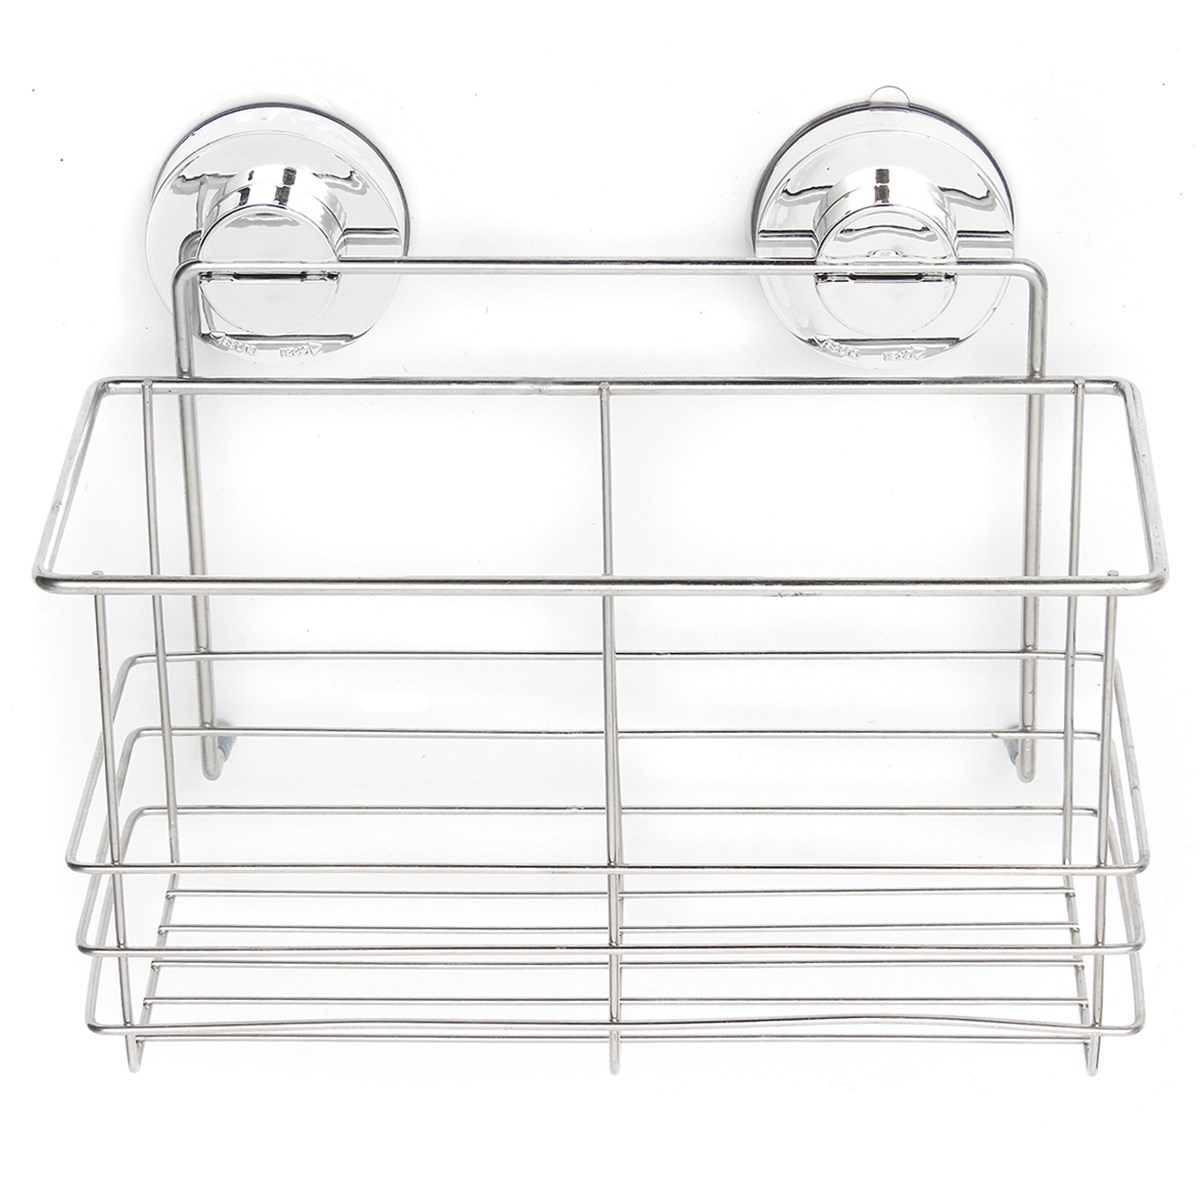 Online Get Cheap Bedroom Shelves Aliexpress Alibaba